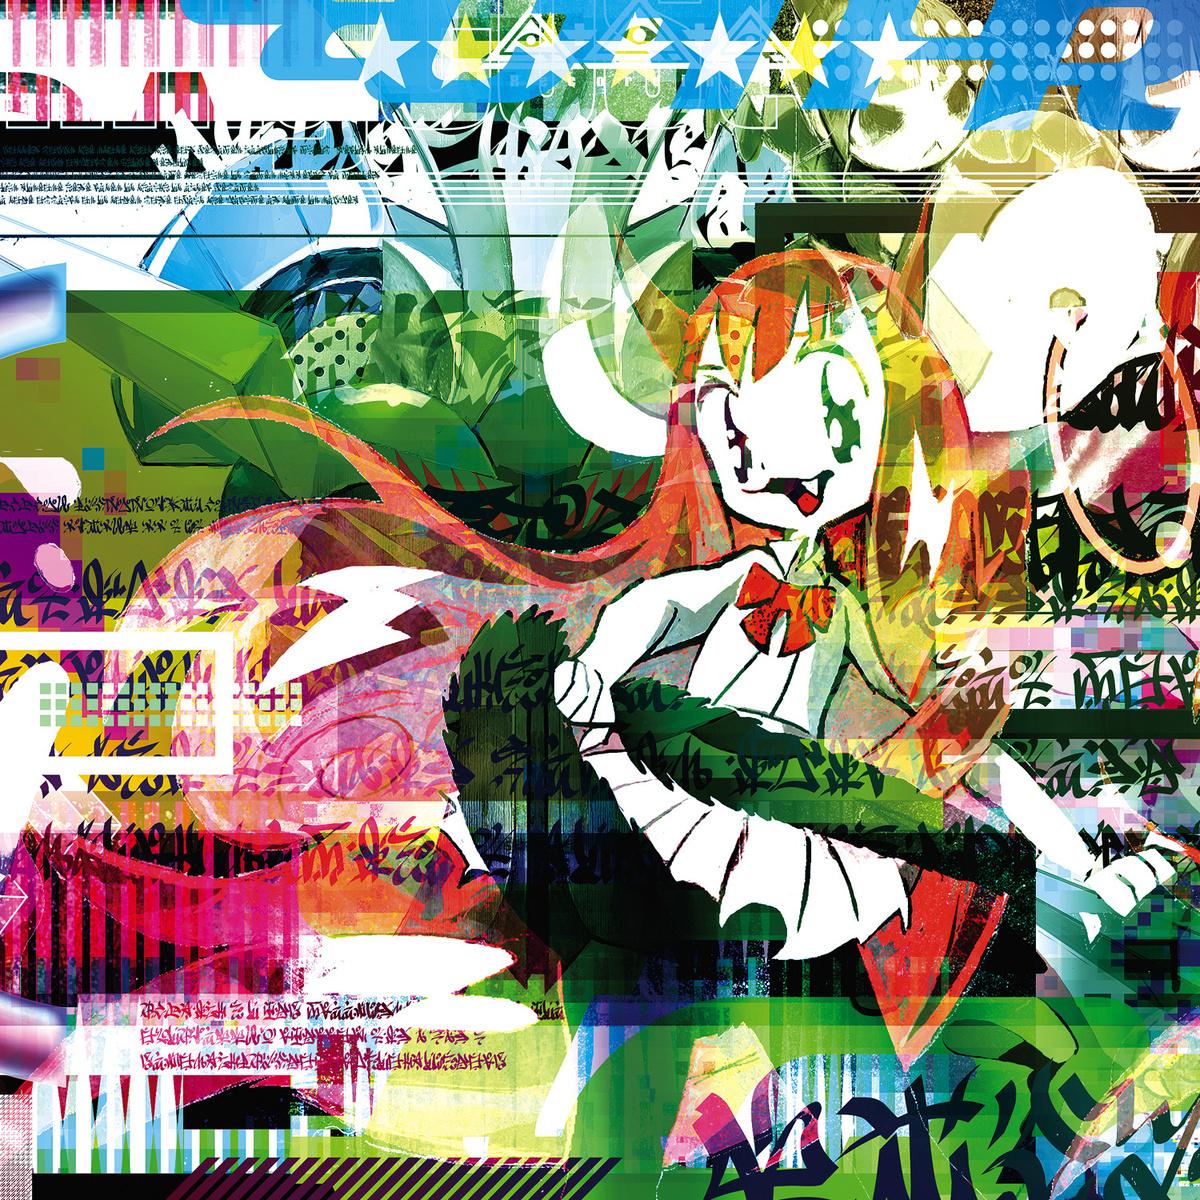 (MP3) 反復回転時計 〜RUNNING COST〜 - DJ TECHNORCH [TCNCD006]